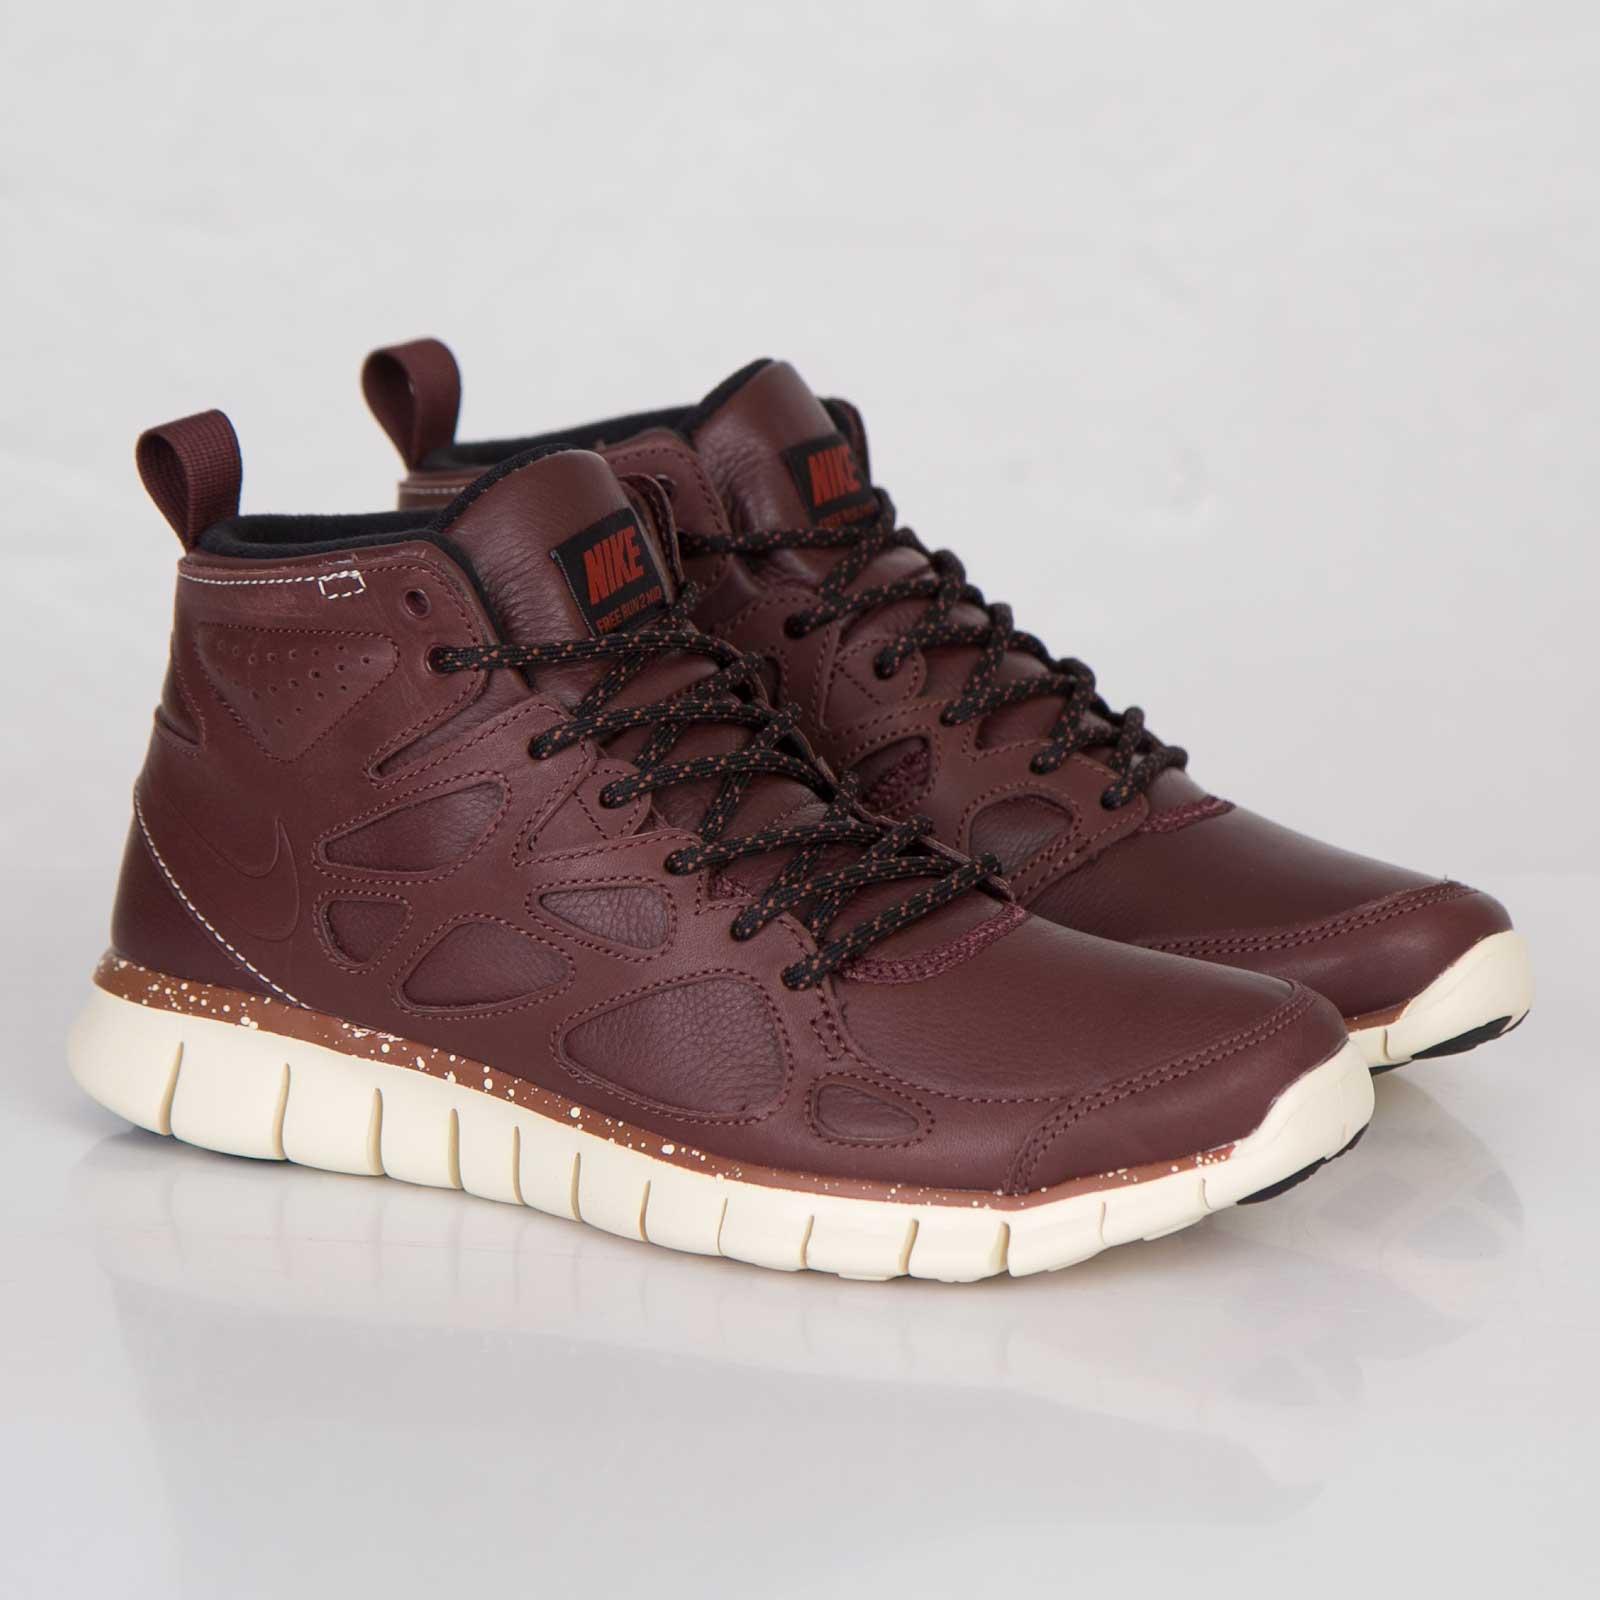 7f04ac93ebc5 coupon code nike free run 2 sneakerboot quickstrike 9a3ce 3ee73